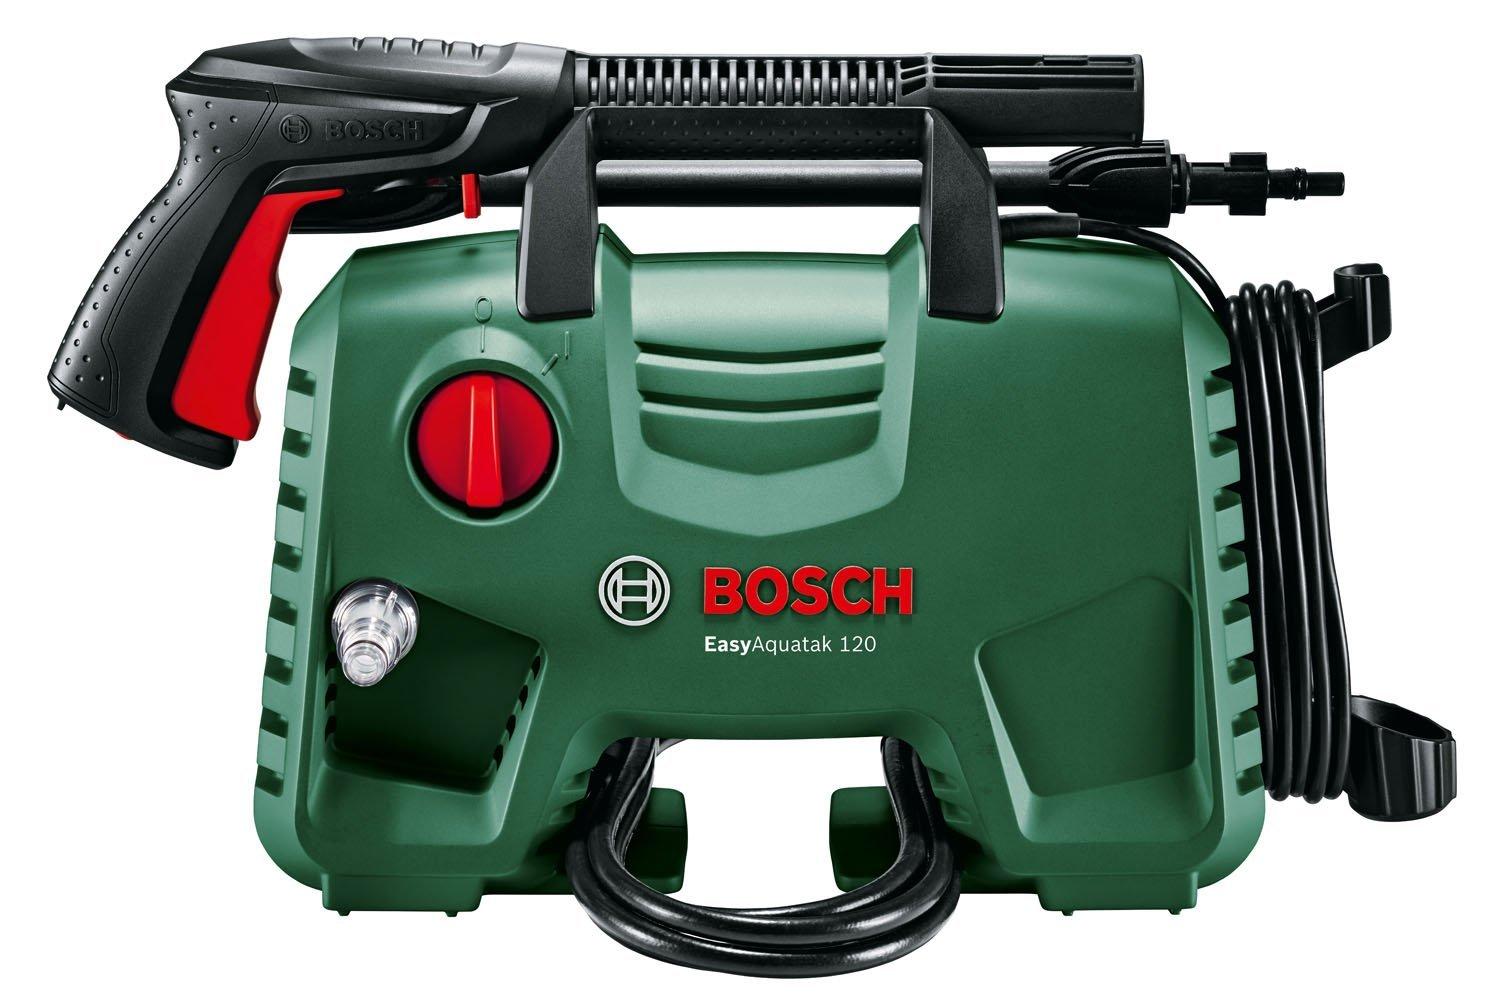 nettoyeur-haute-pression-Bosch-AQT-33-11-6 Avis nettoyeur haute pression Bosch AQT 33-11